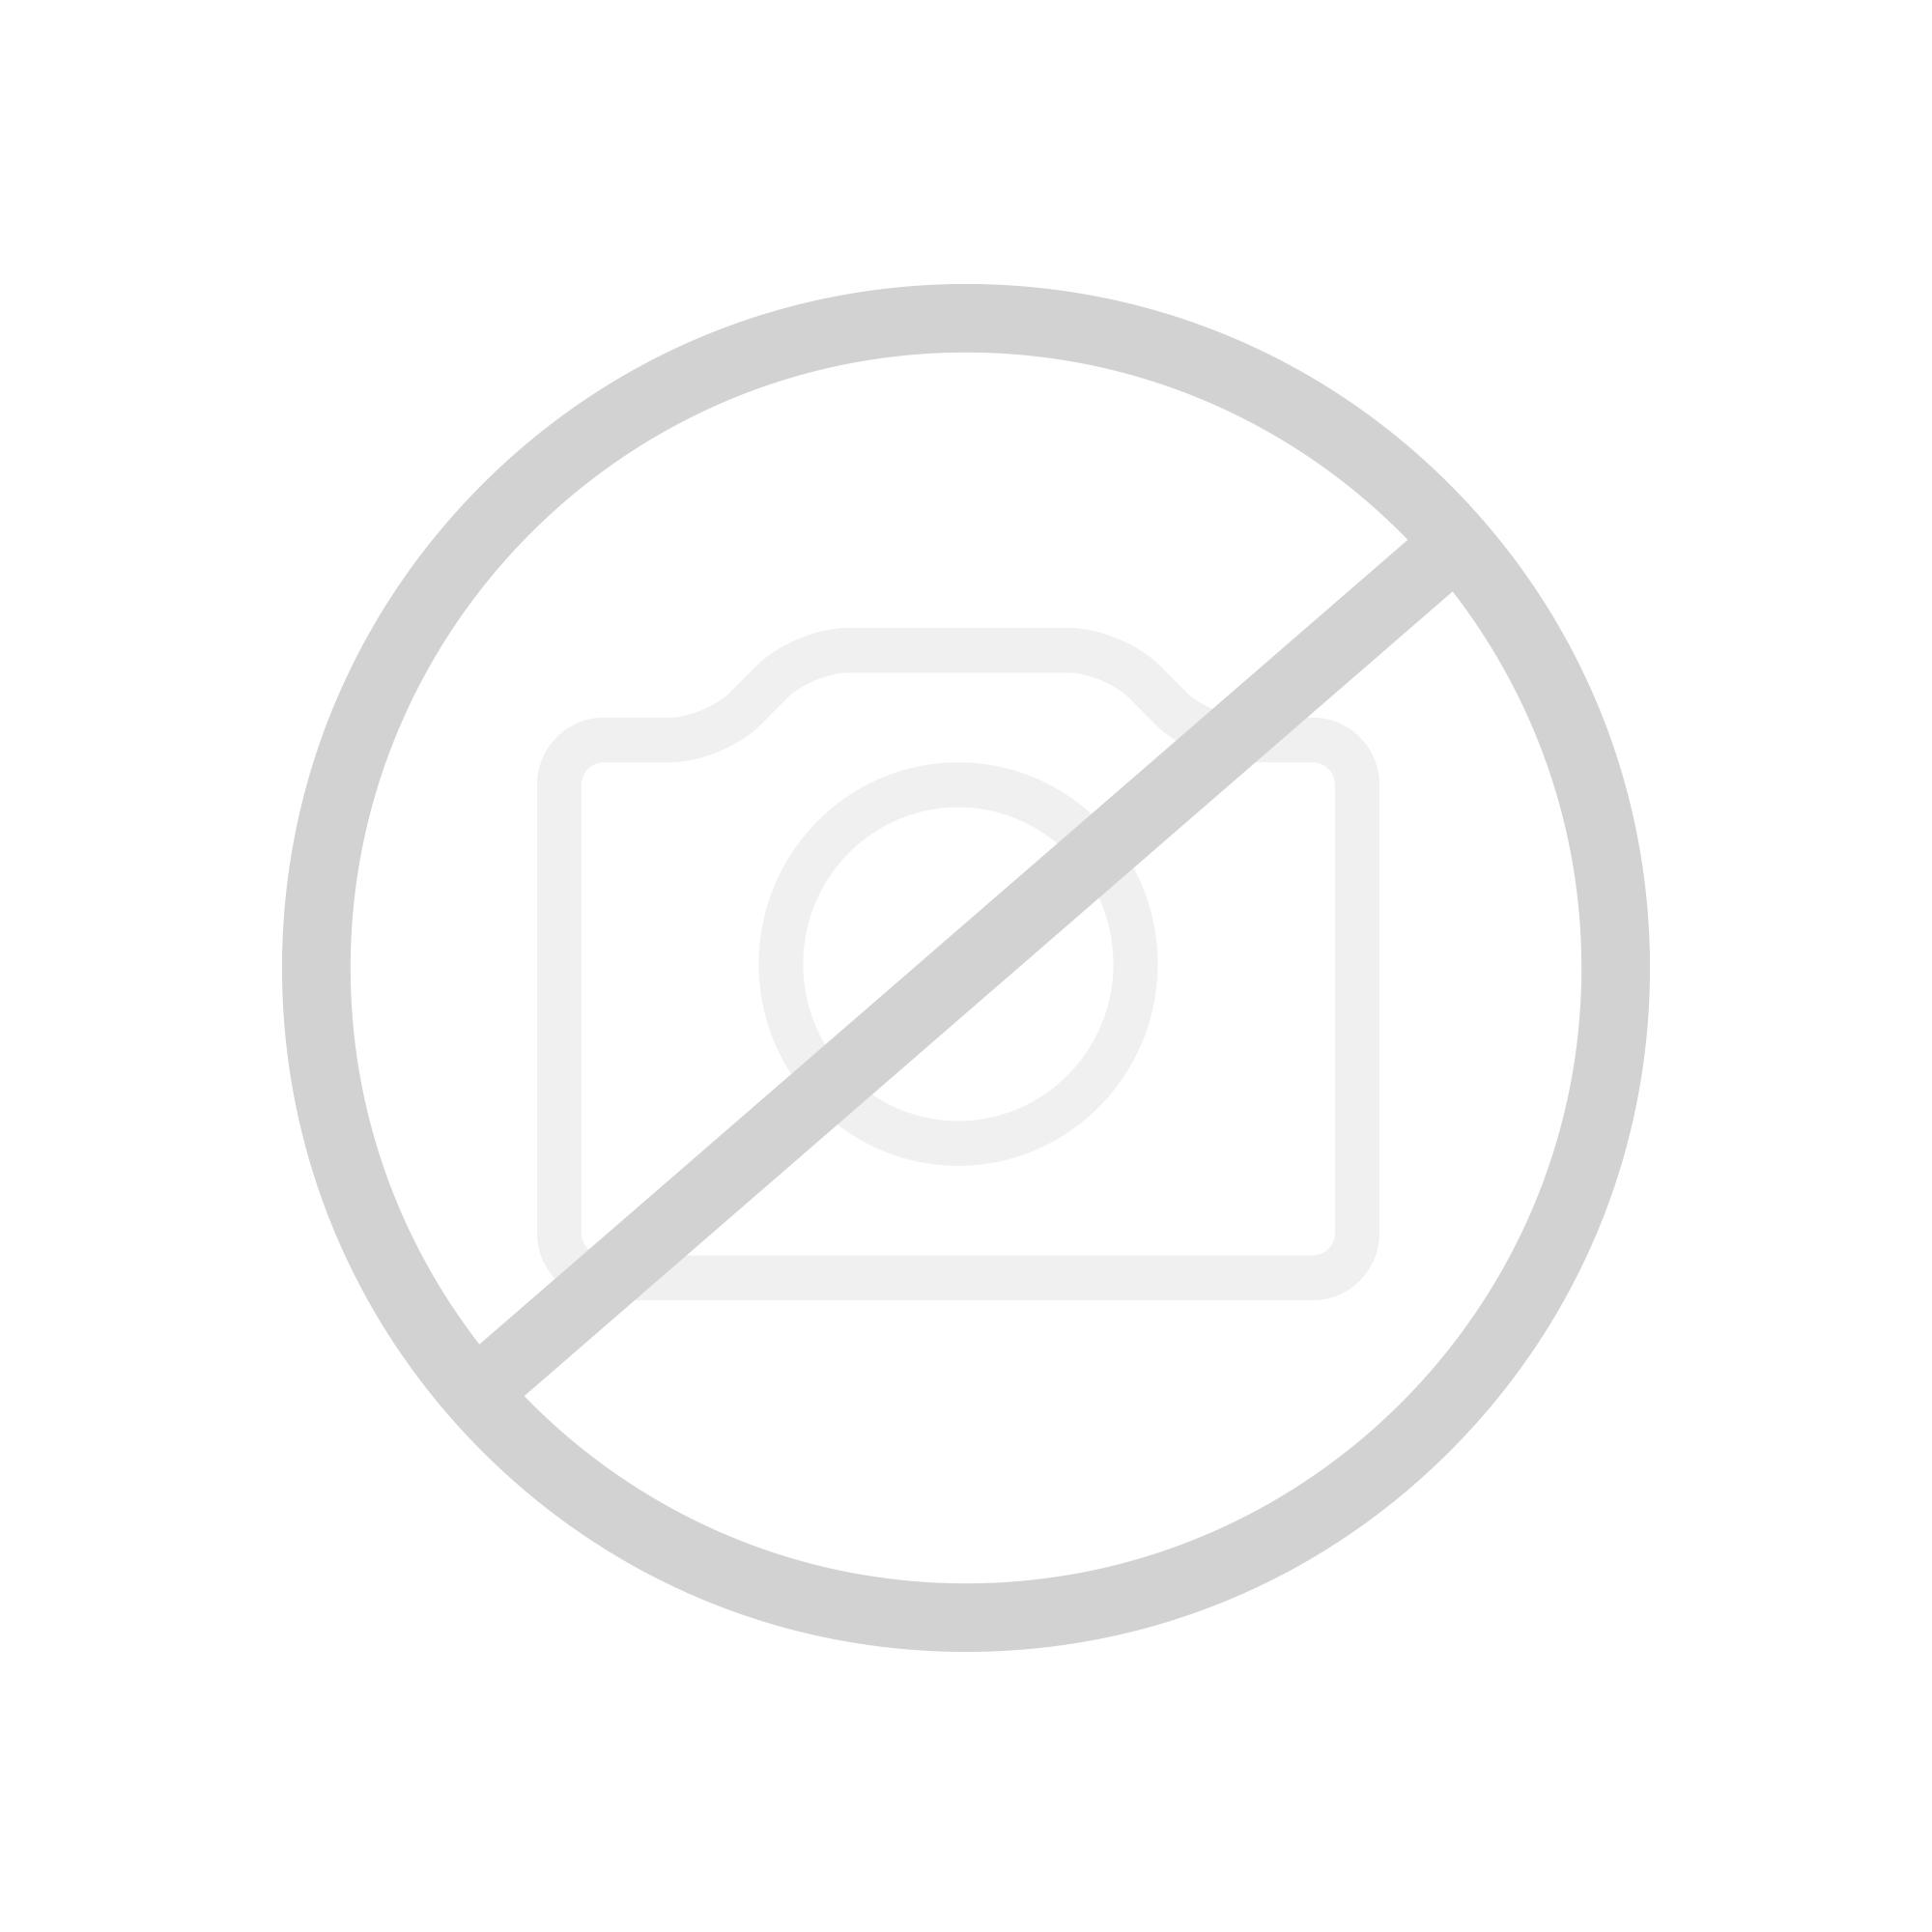 hansgrohe raindance s 240 air 1jet kopfbrause mit brausearm ecosmart 27461000 reuter onlineshop. Black Bedroom Furniture Sets. Home Design Ideas